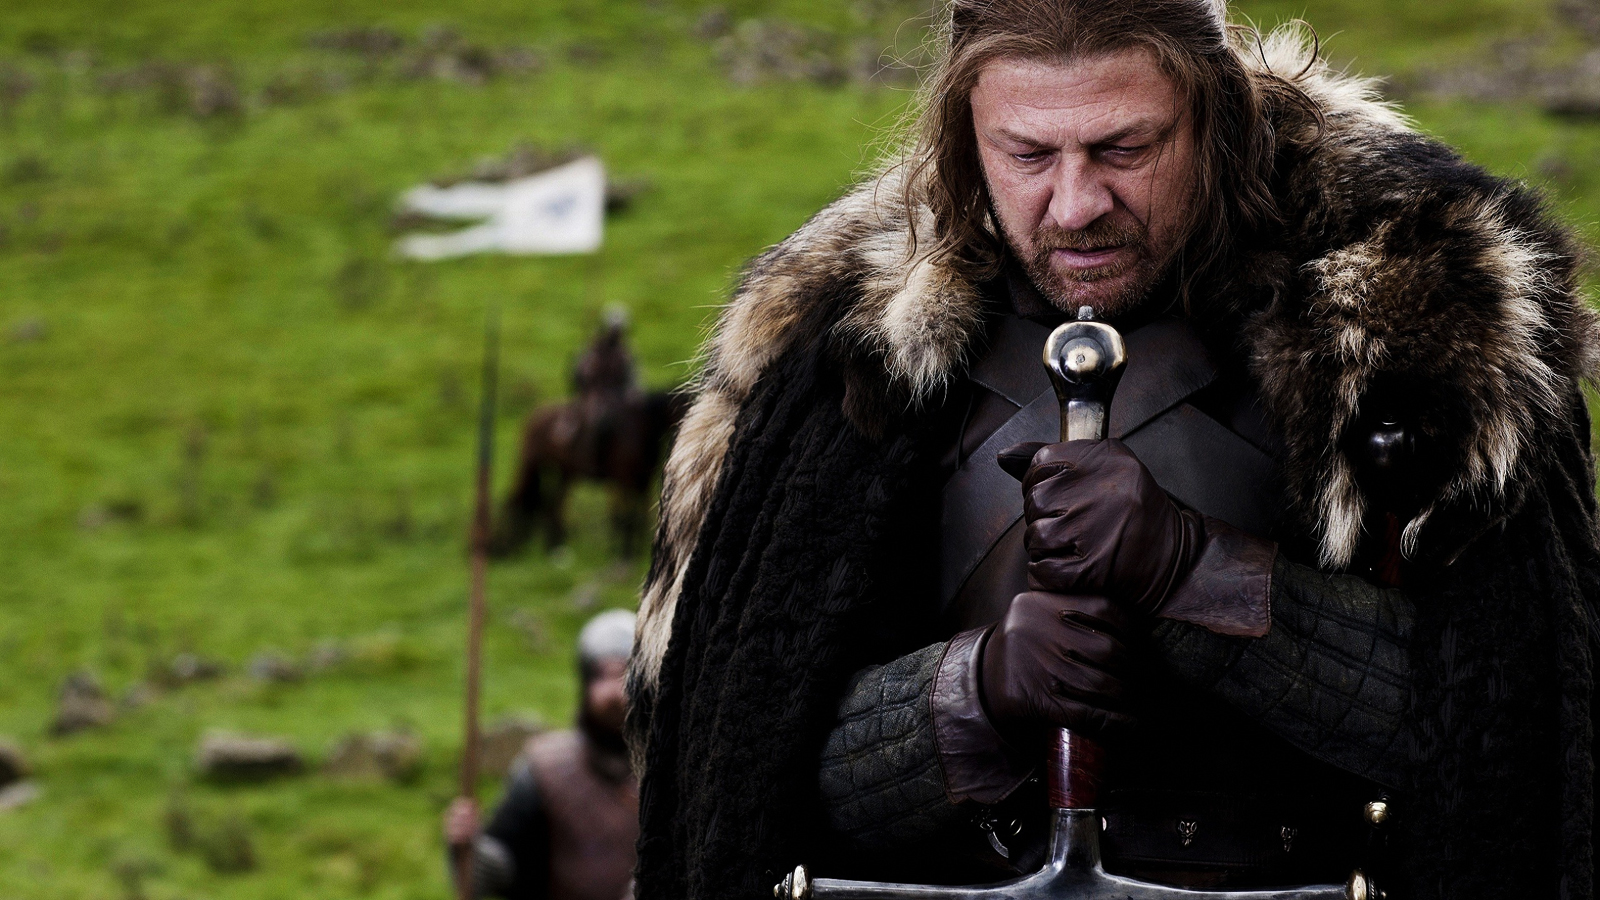 Game of Thrones Character Eddard Ned Stark HD Wallpaper 1600x900